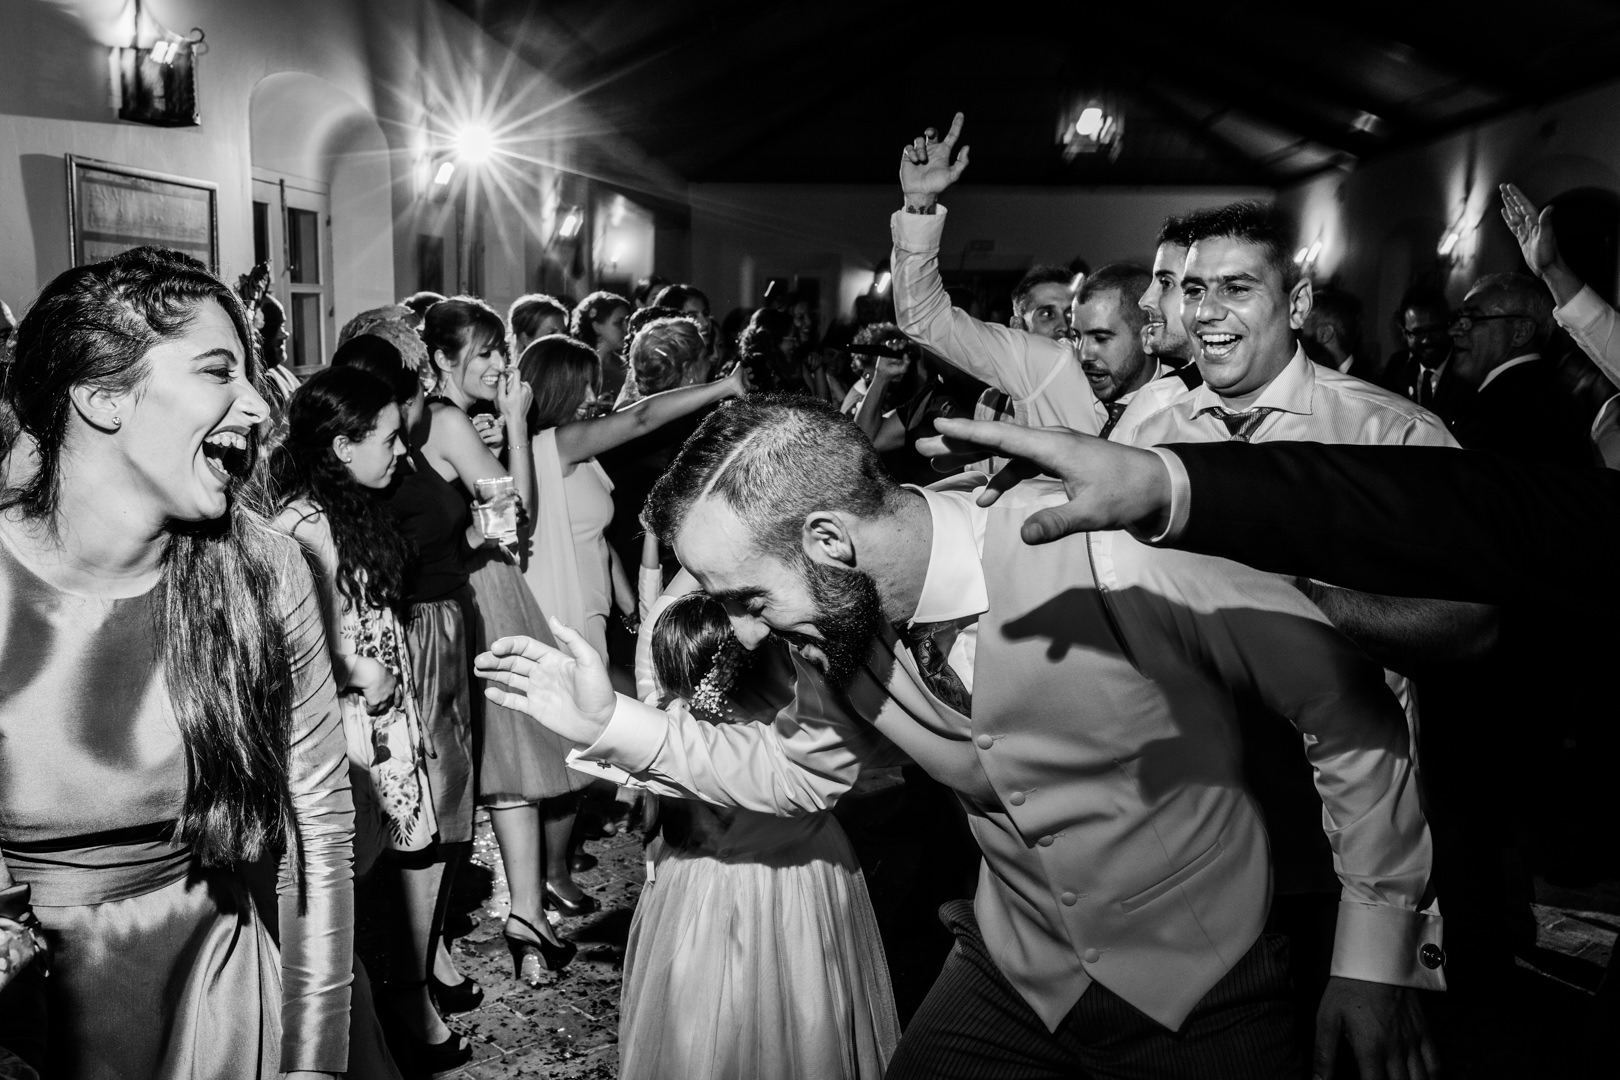 Boda-sevilla-Wedding-engagement-Rafael-Torres-fotografo-bodas-sevilla-madrid-barcelona-wedding-photographer--83.jpg